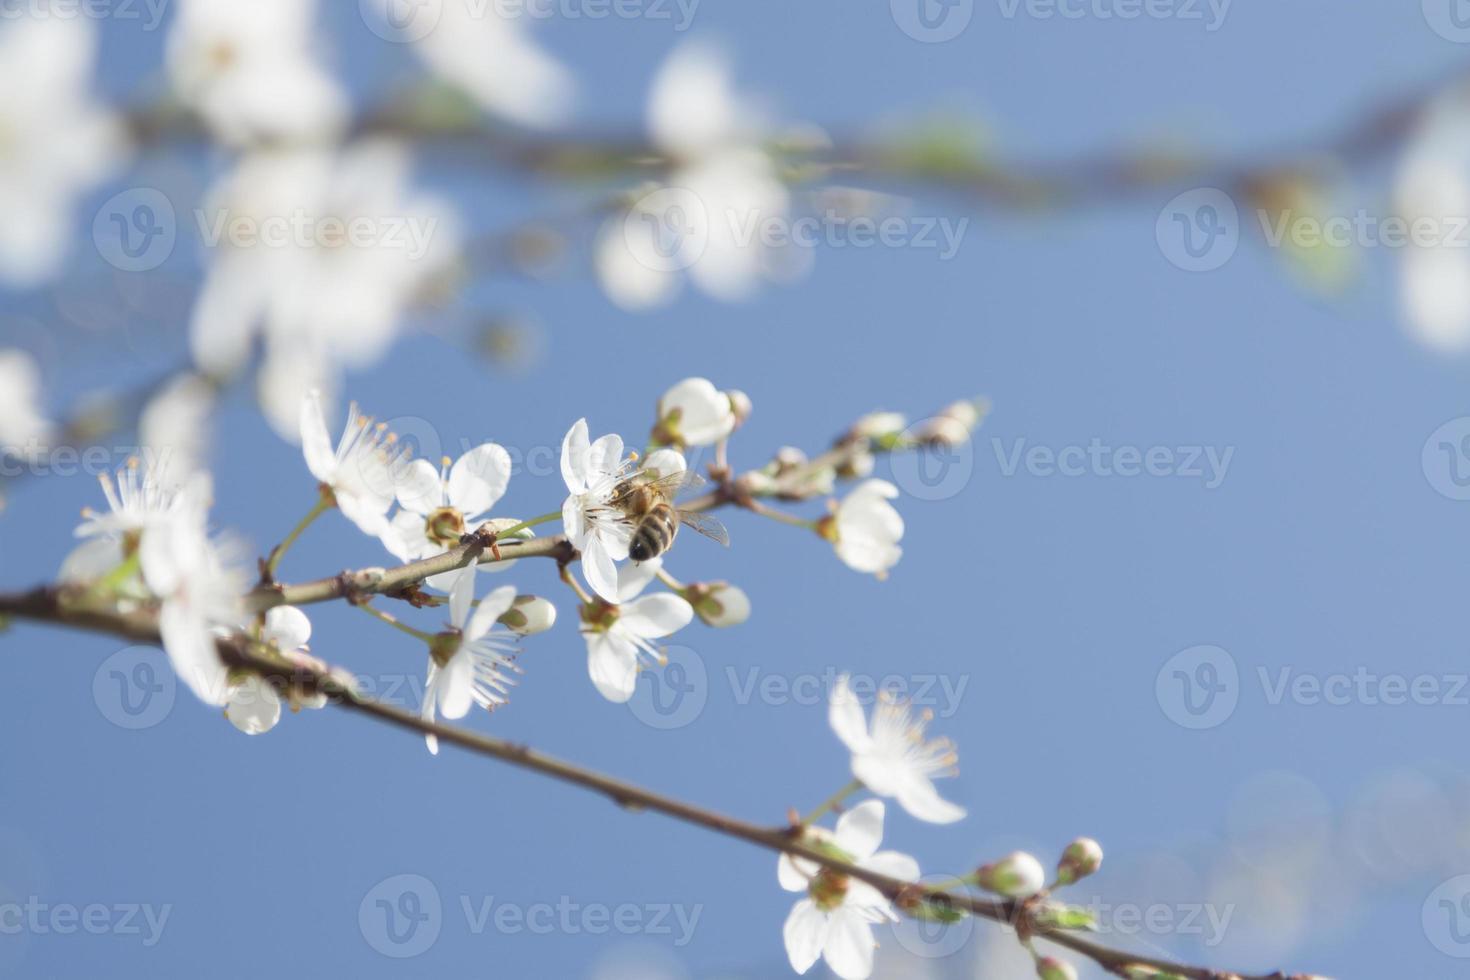 abeja en una cereza silvestre foto